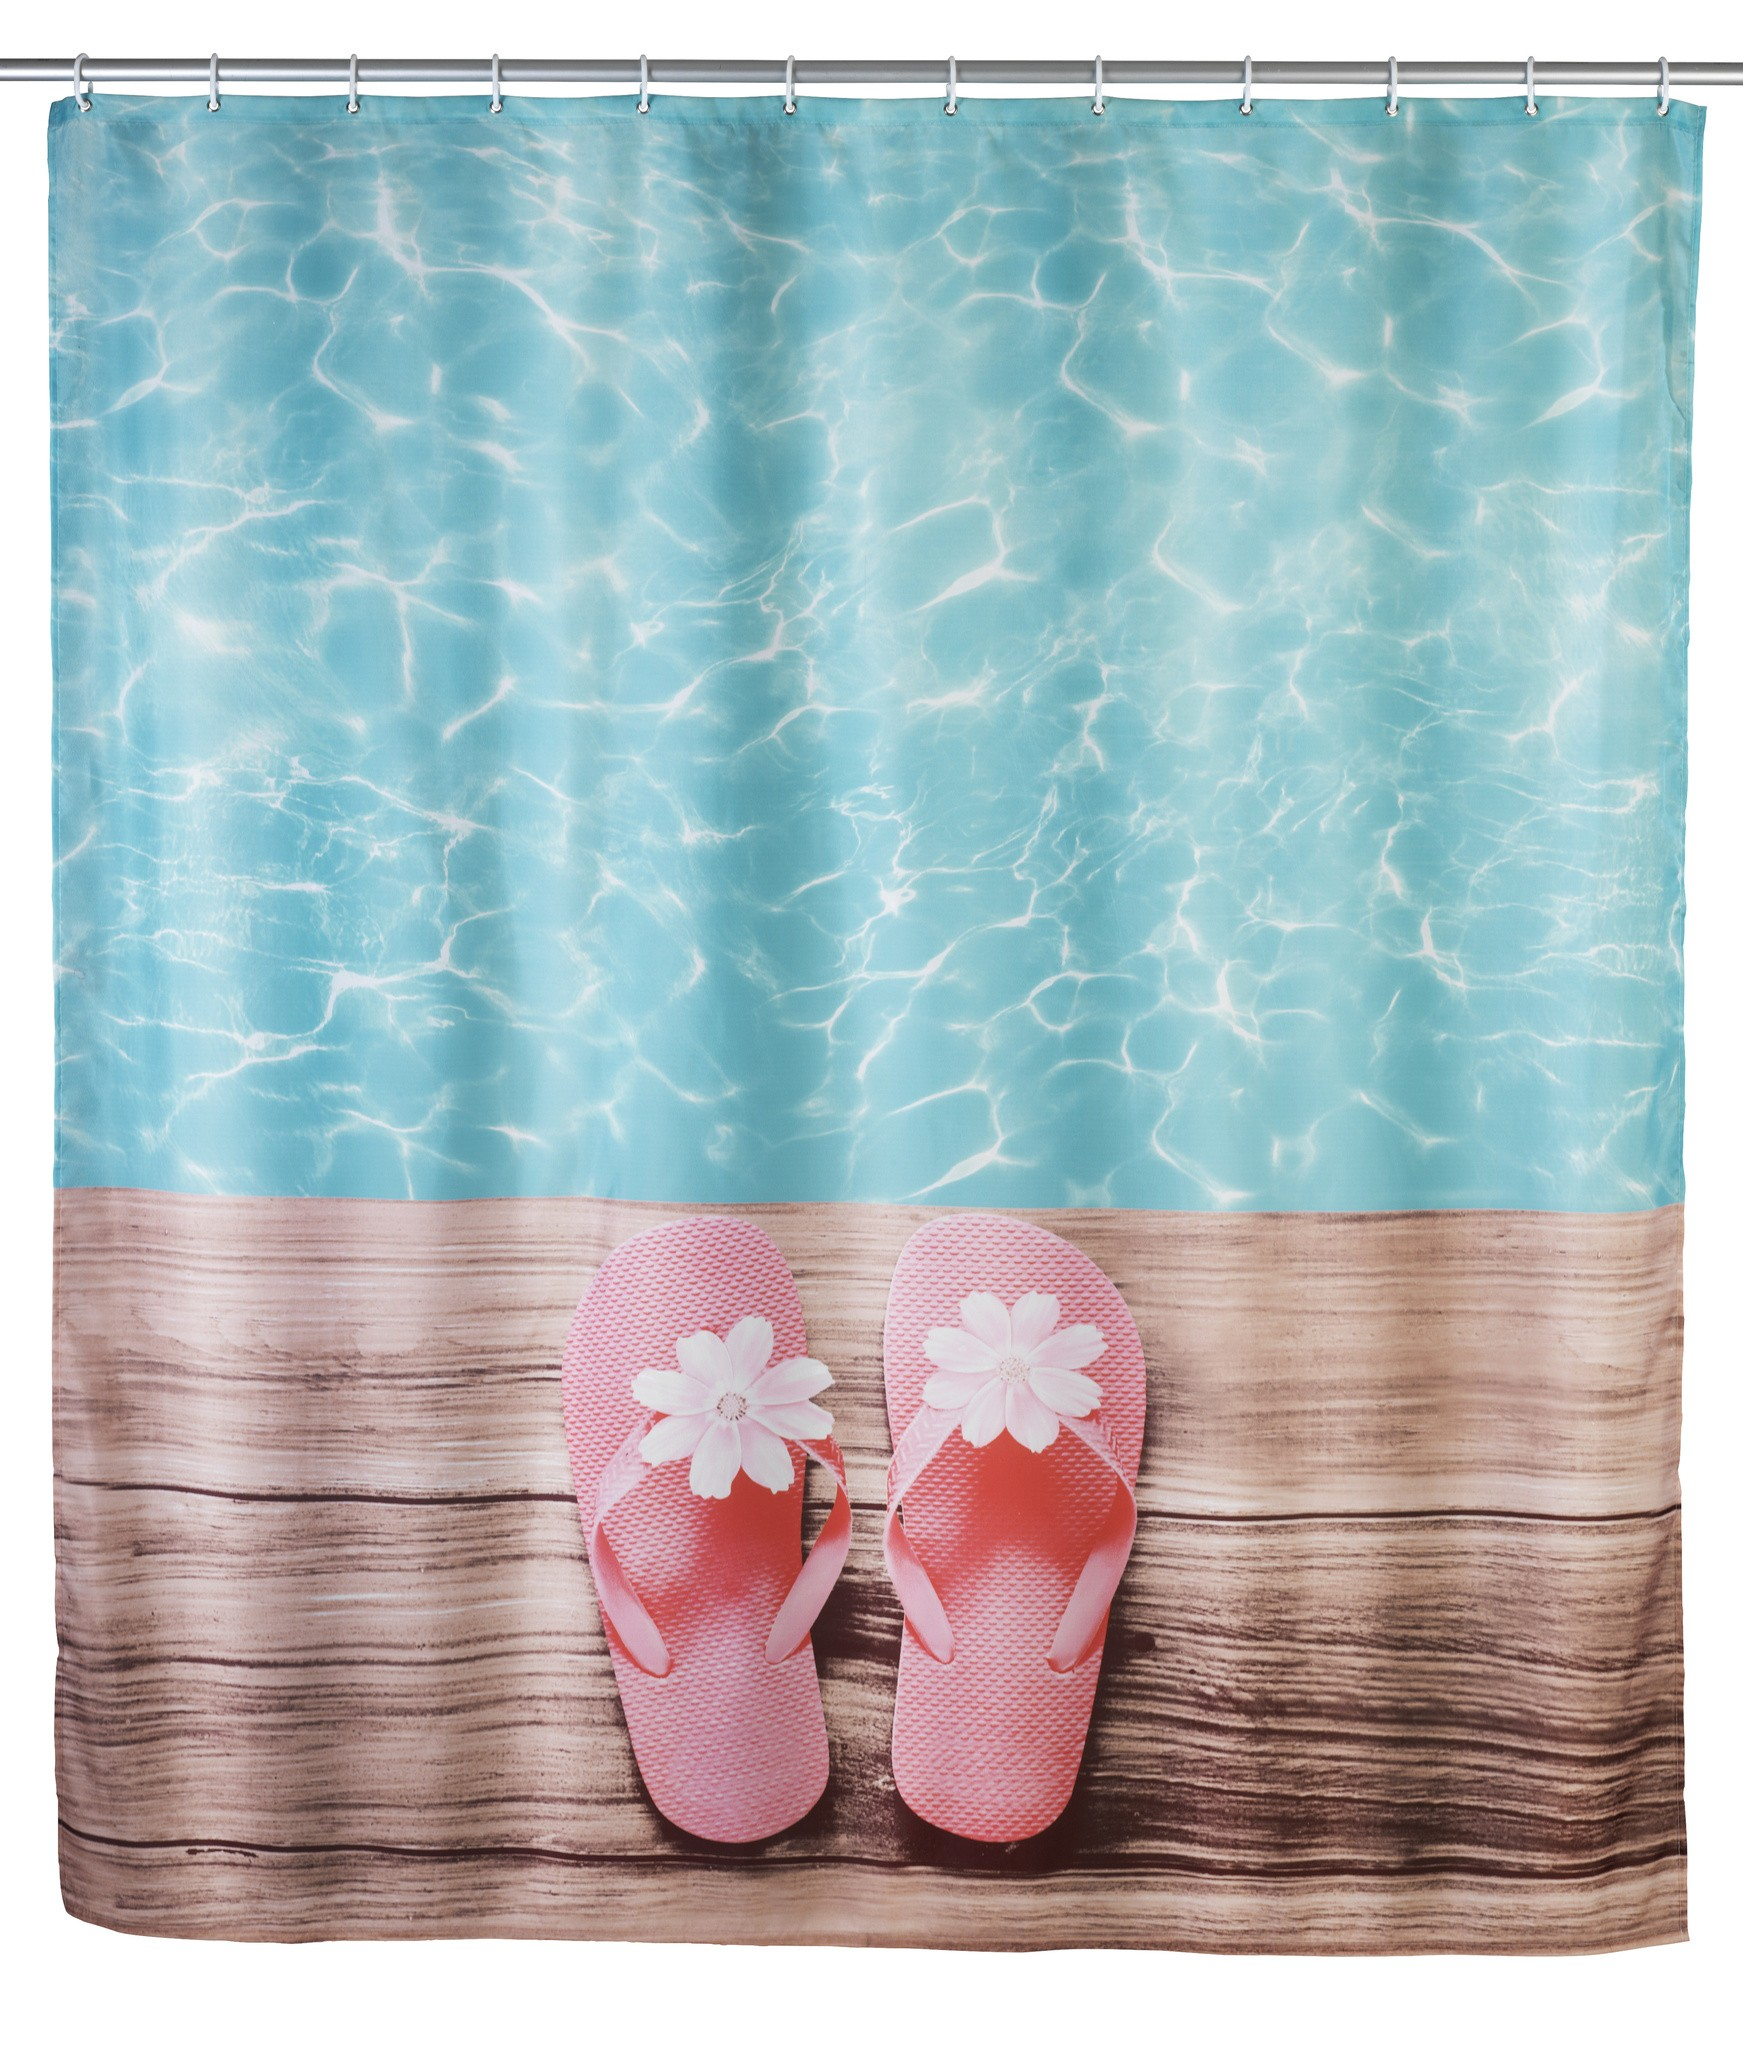 Wenko Duschvorhang Hawaii, 180 x 200 cm, waschbar